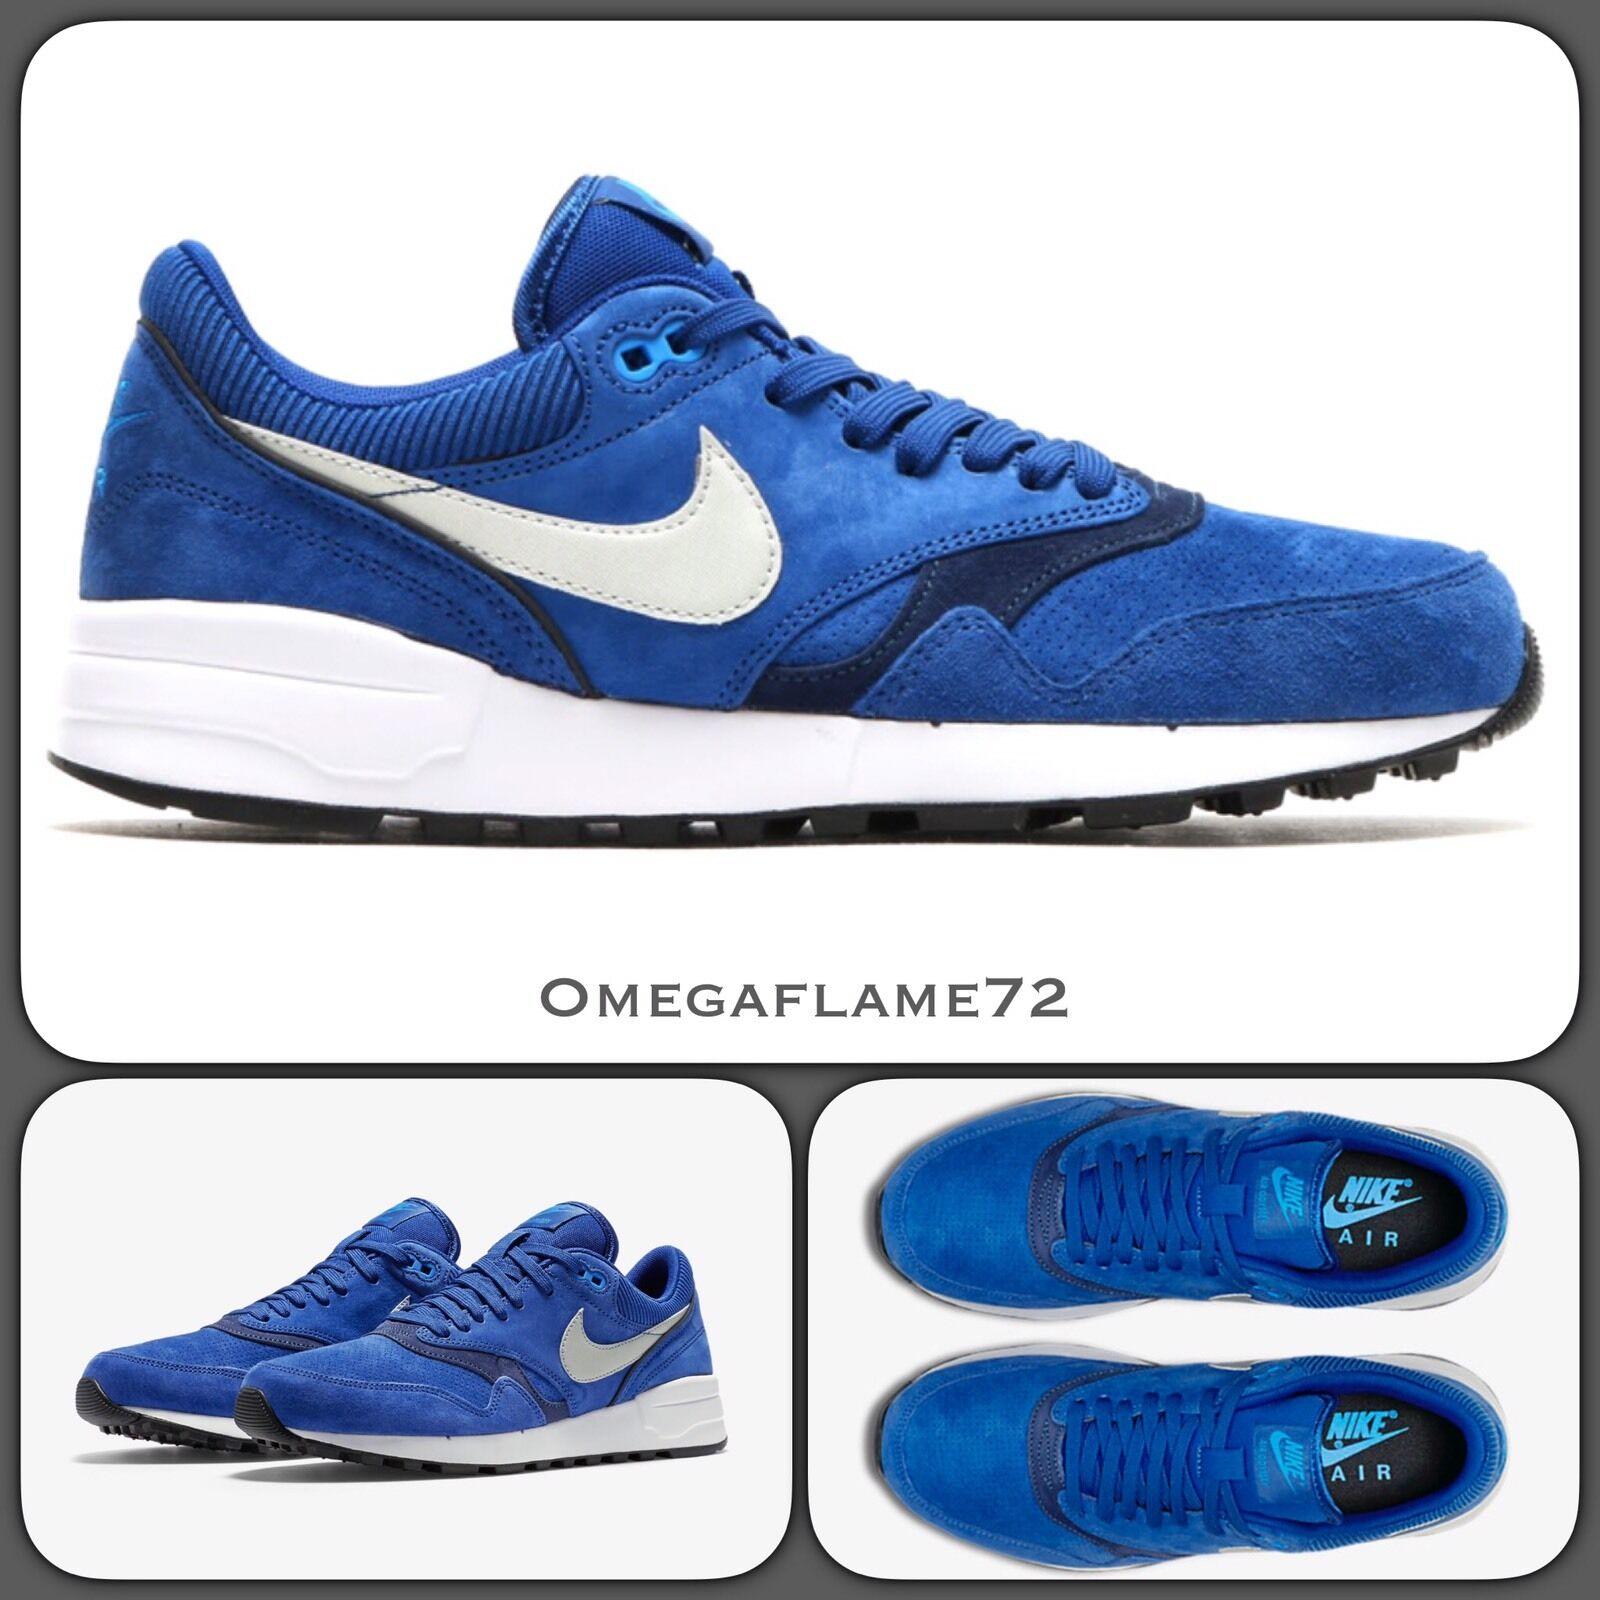 Nike Air Odyssey LTR OG 684773-4029.5 EUR 44.5 US 10.5 Max 1 Light